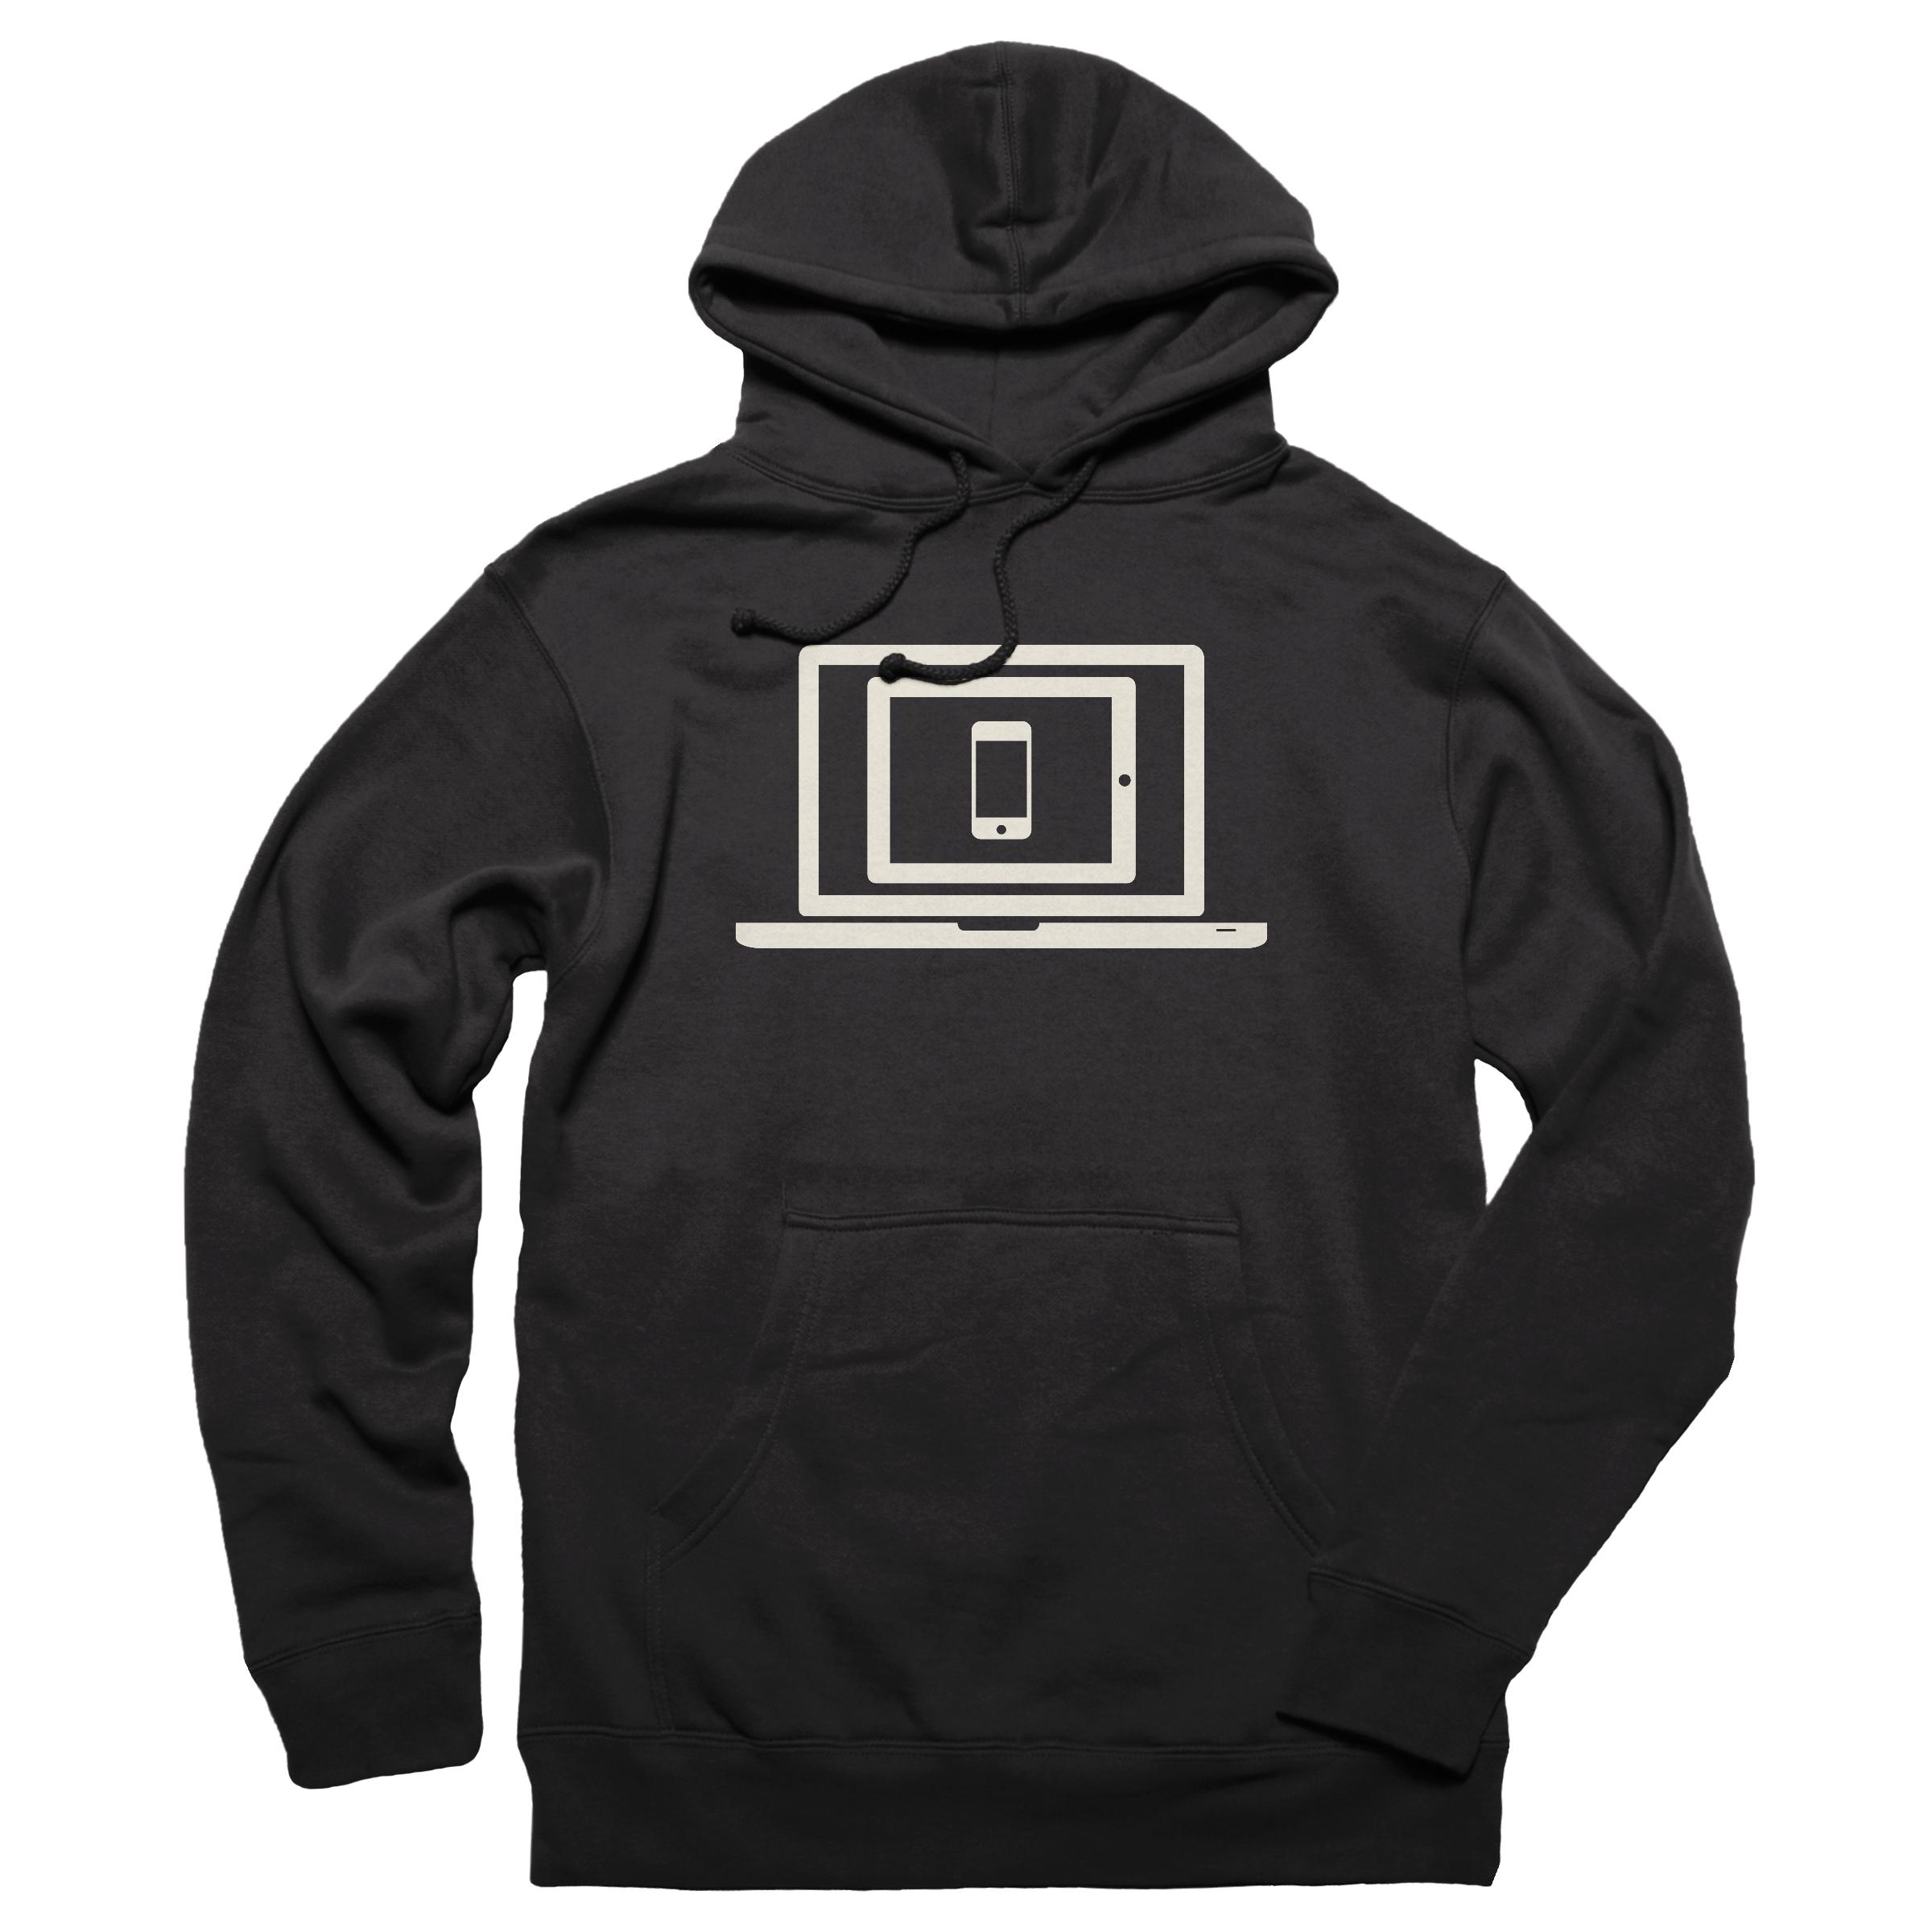 Responsive Design Pullover Hoodie